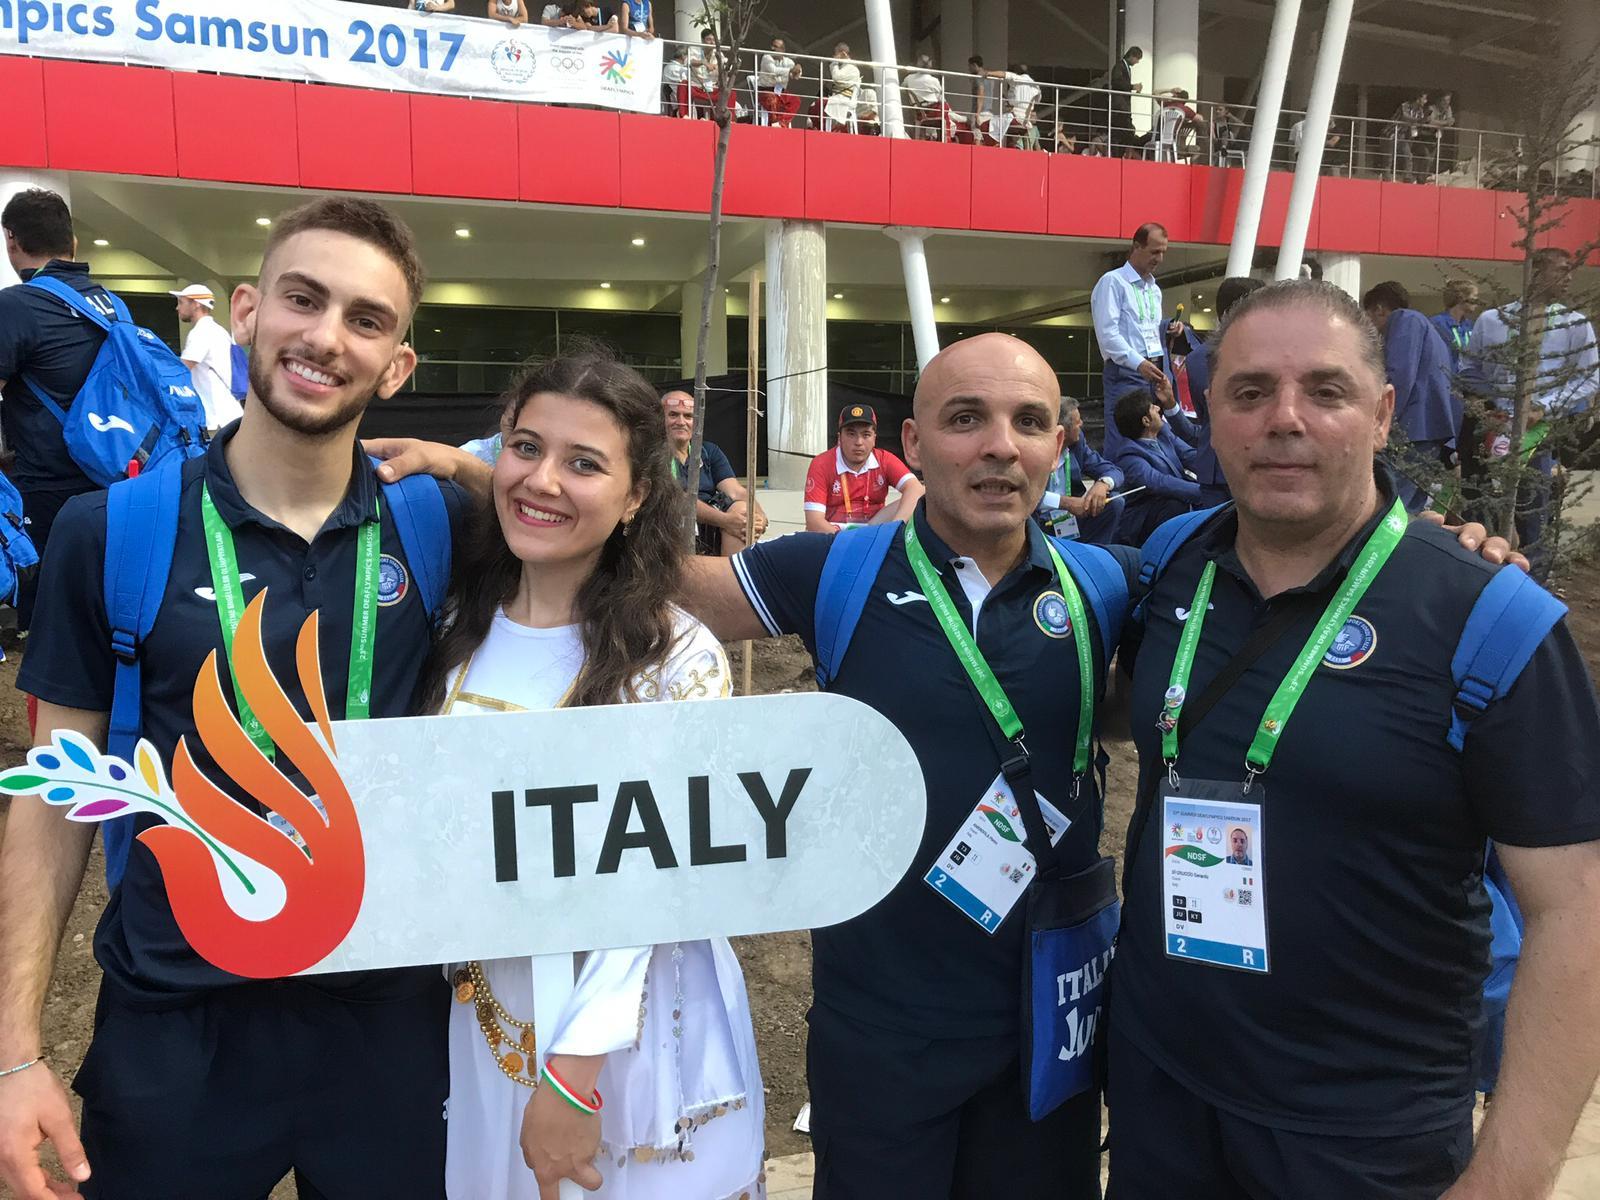 Campionati Europei di Judo, le speranze di Davide Stabile